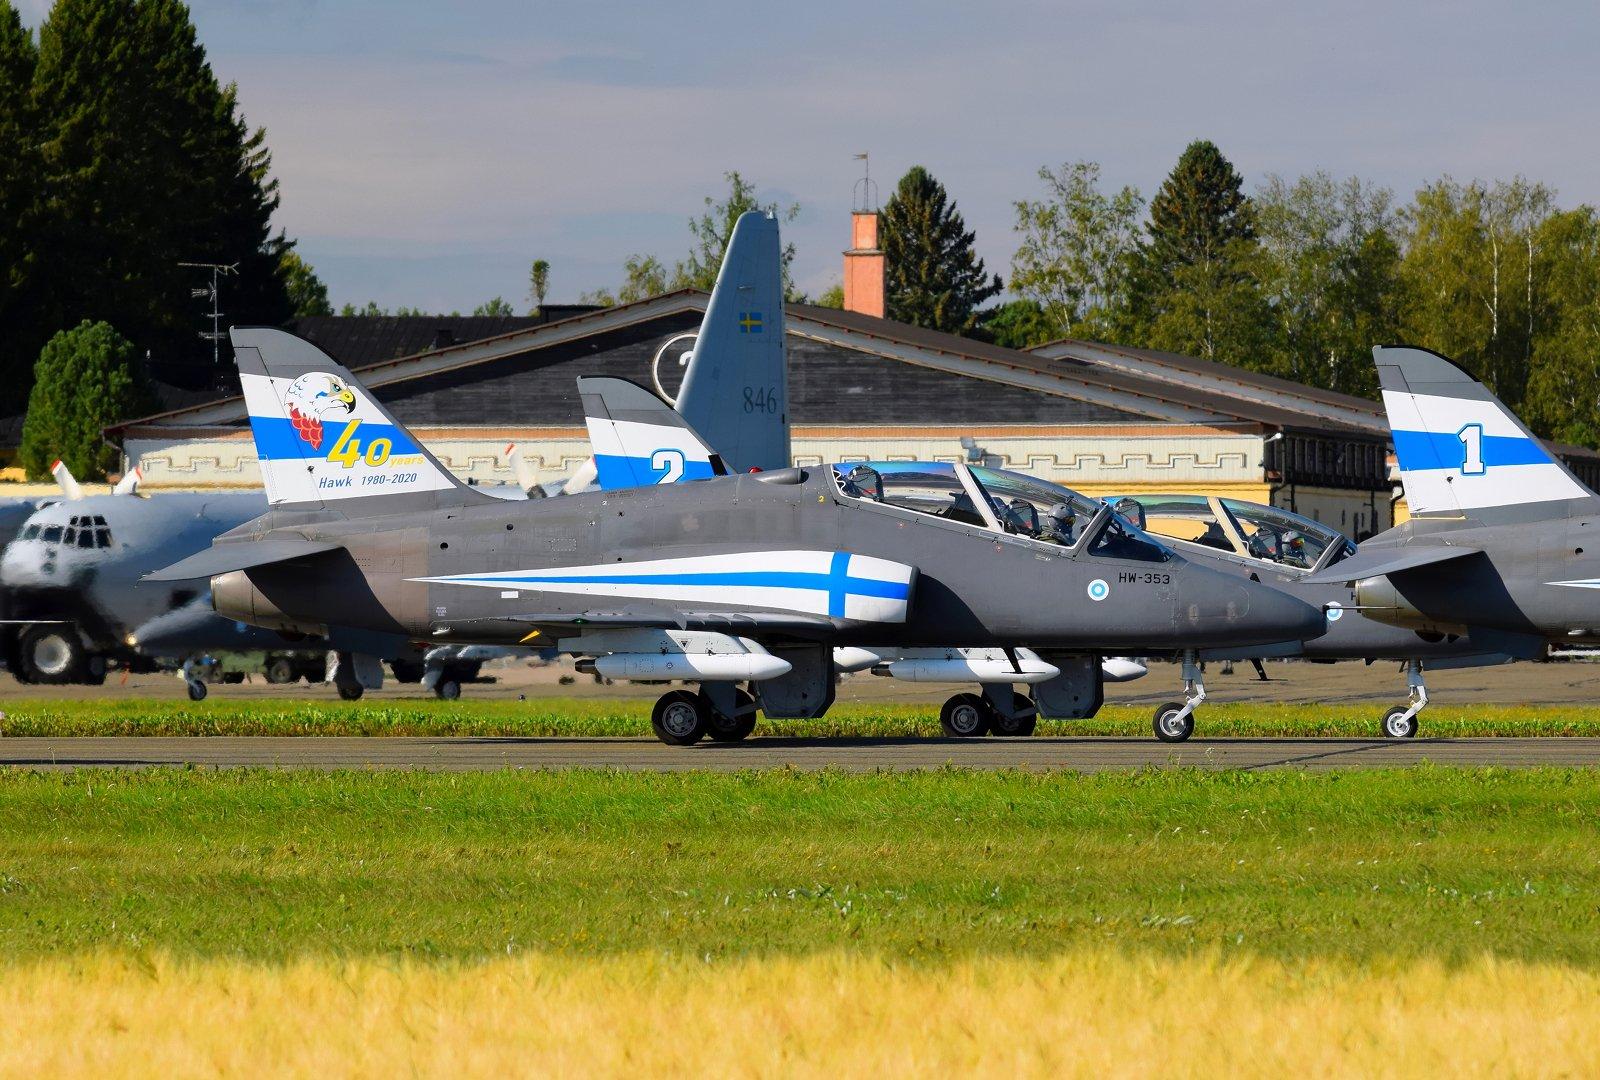 HW-353 - British Aerospace Hawk Mk.51A - Ilmavoimat - 31.8.2020